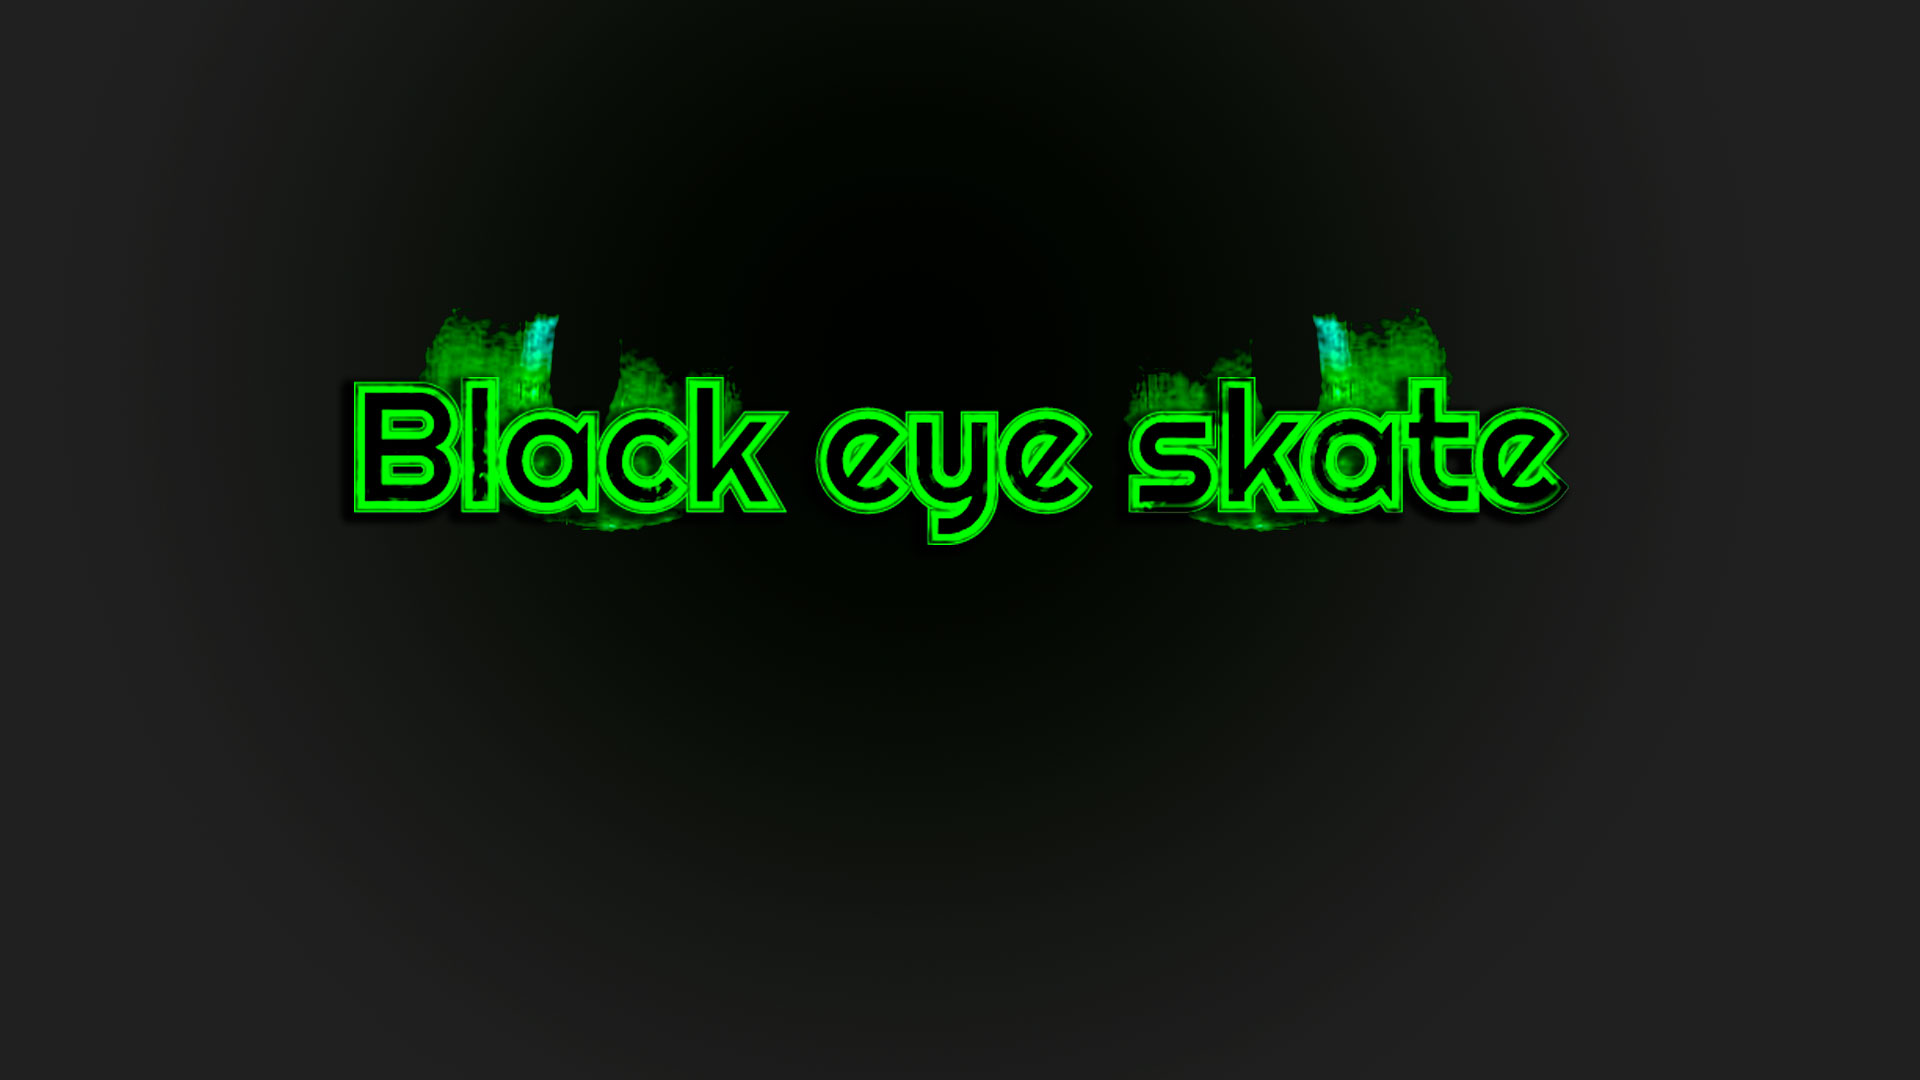 black eye skate